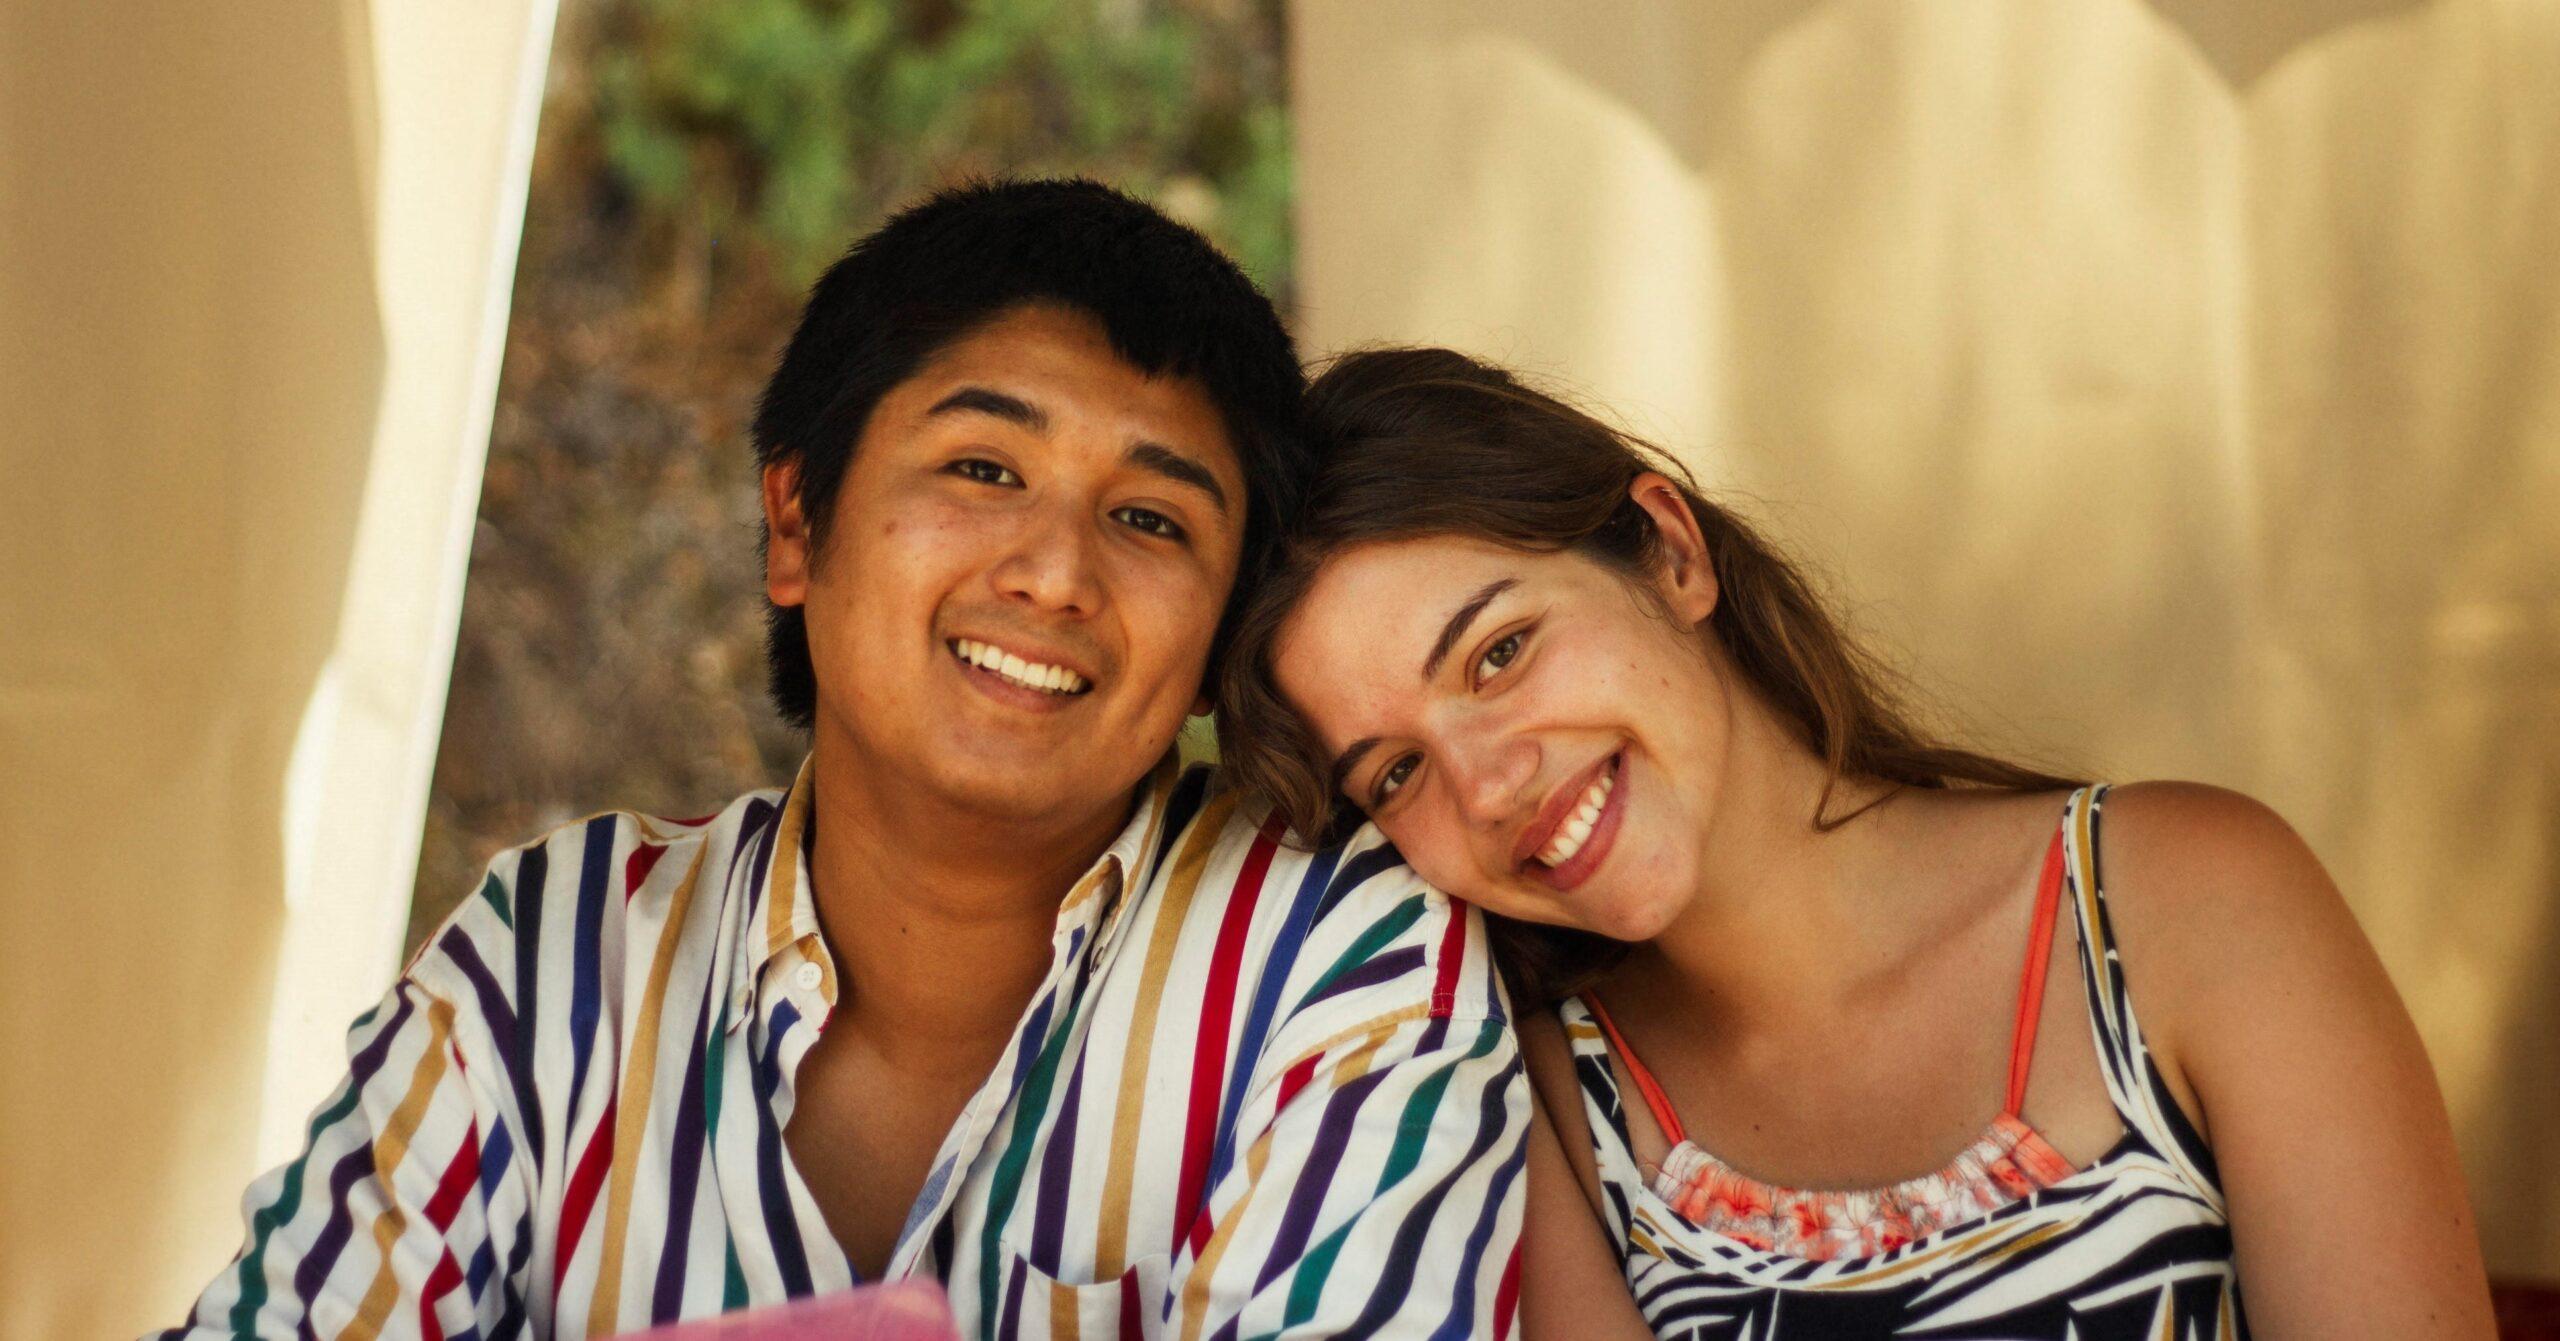 Um casal de jovens